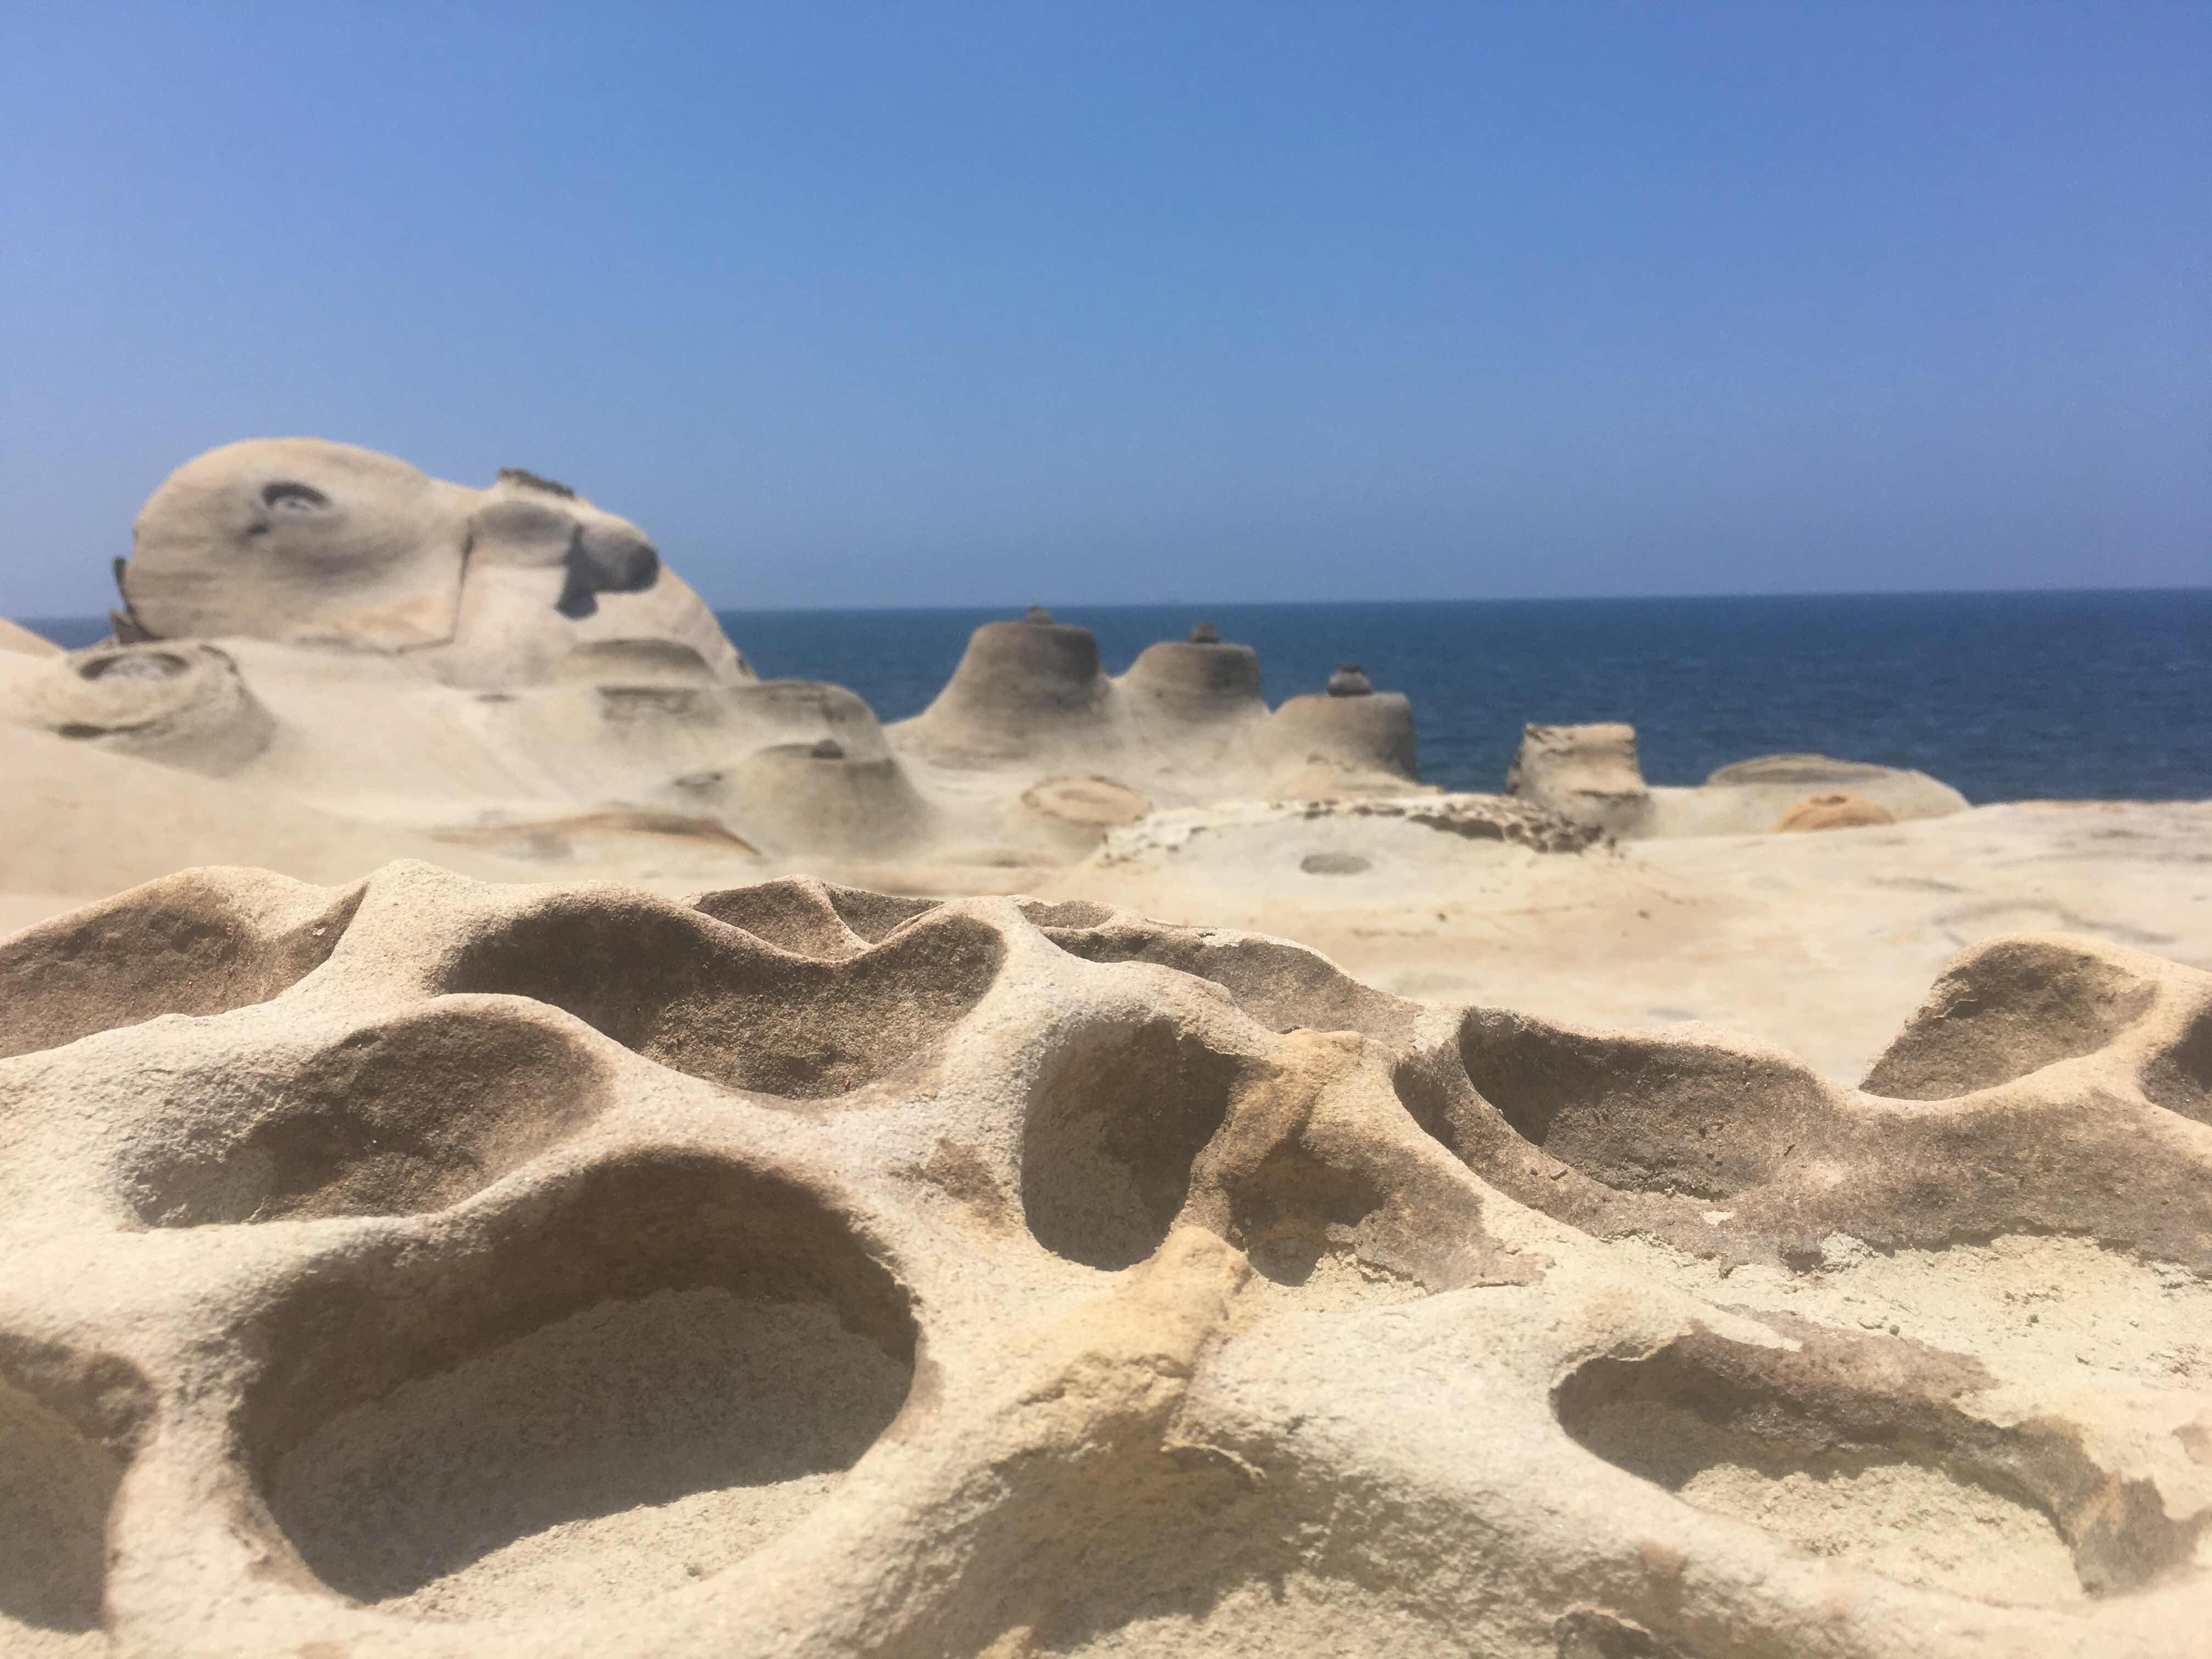 yehliu geopark queen's head yehliu peninsula north coast taipei taiwan honeycomb rock